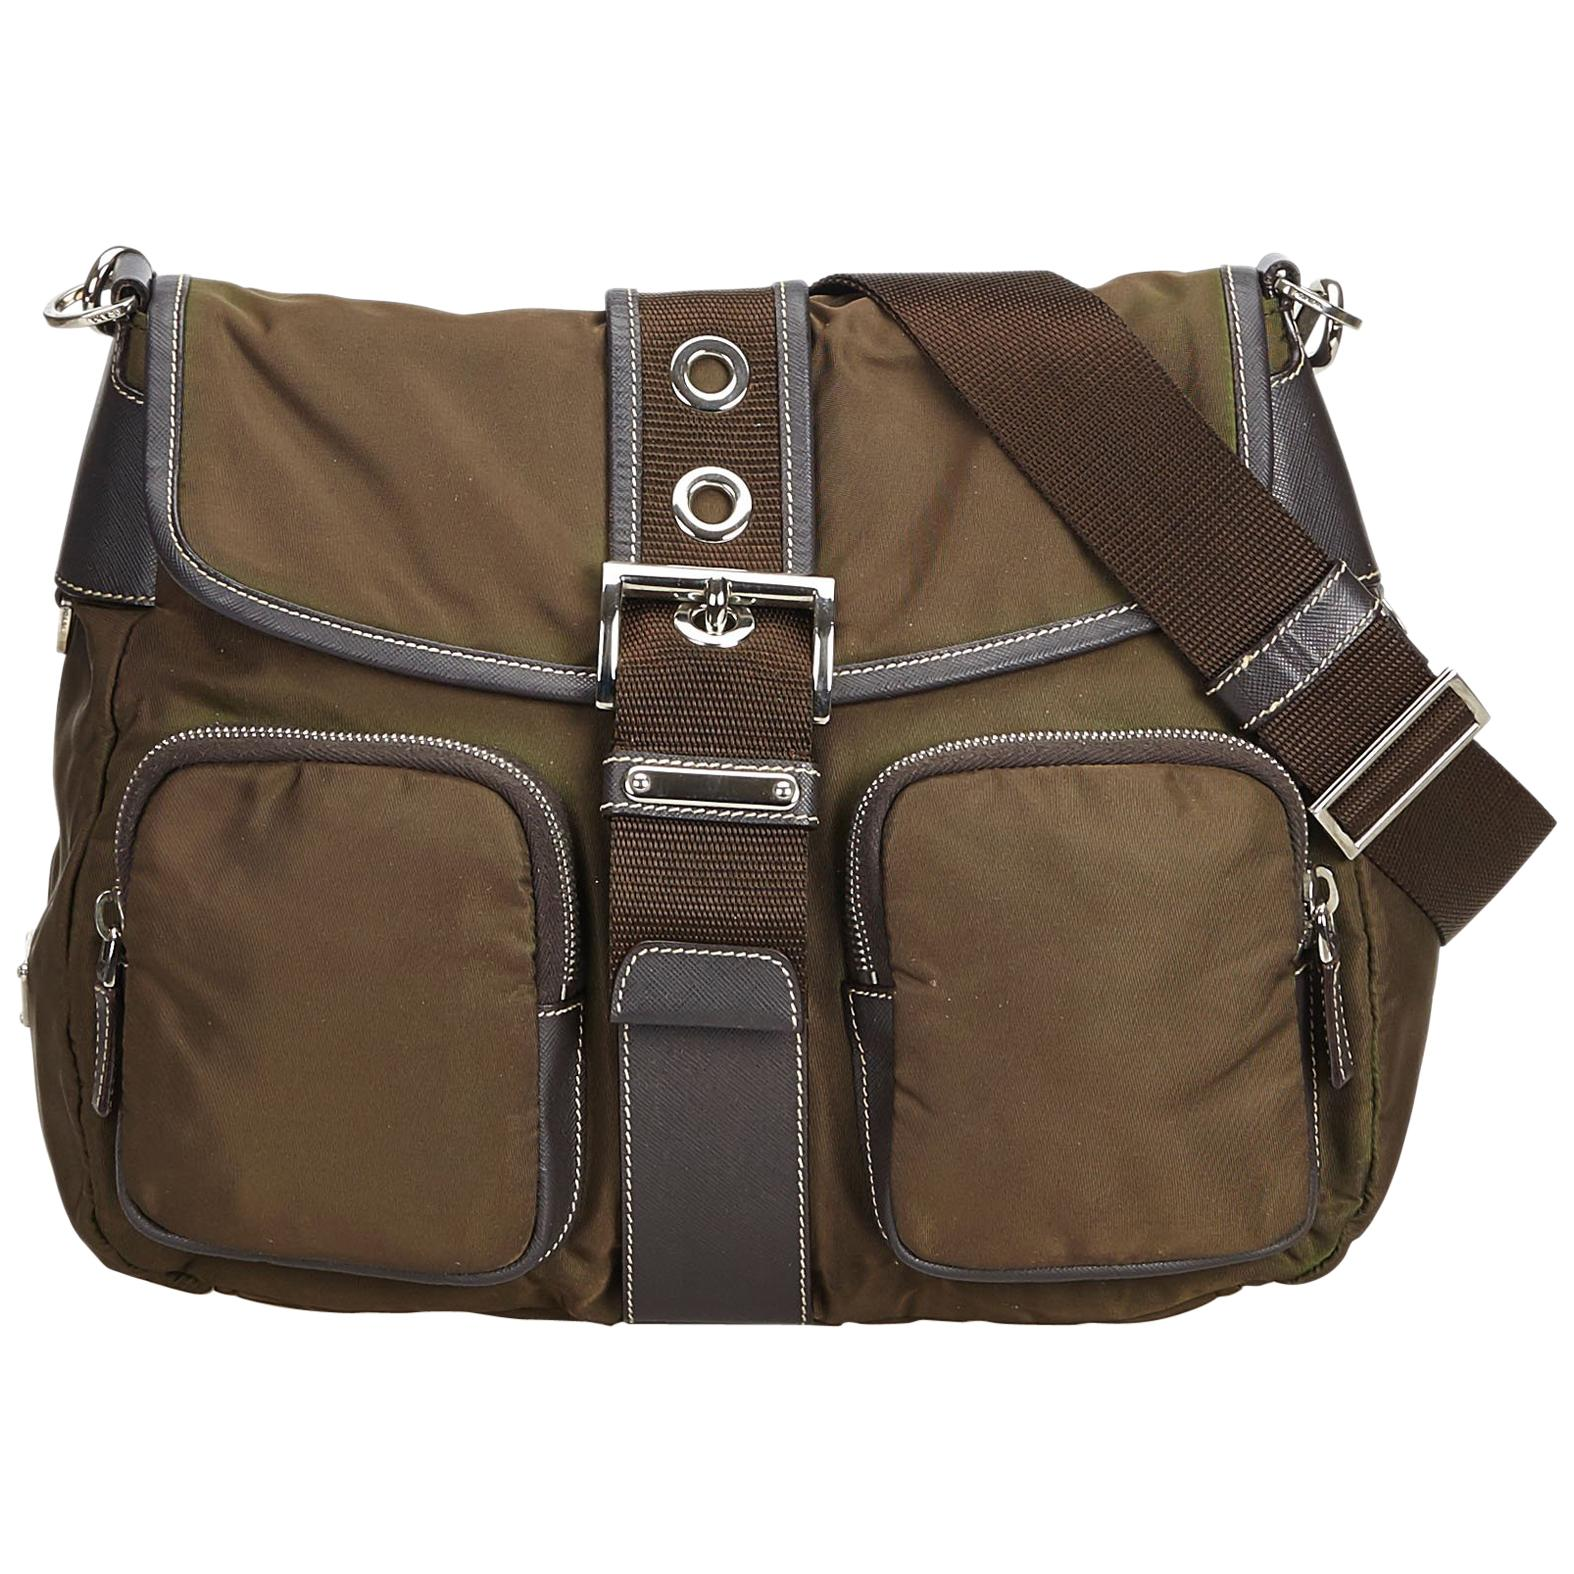 f4339f164dcb46 Vintage Prada Crossbody Bags and Messenger Bags - 127 For Sale at 1stdibs